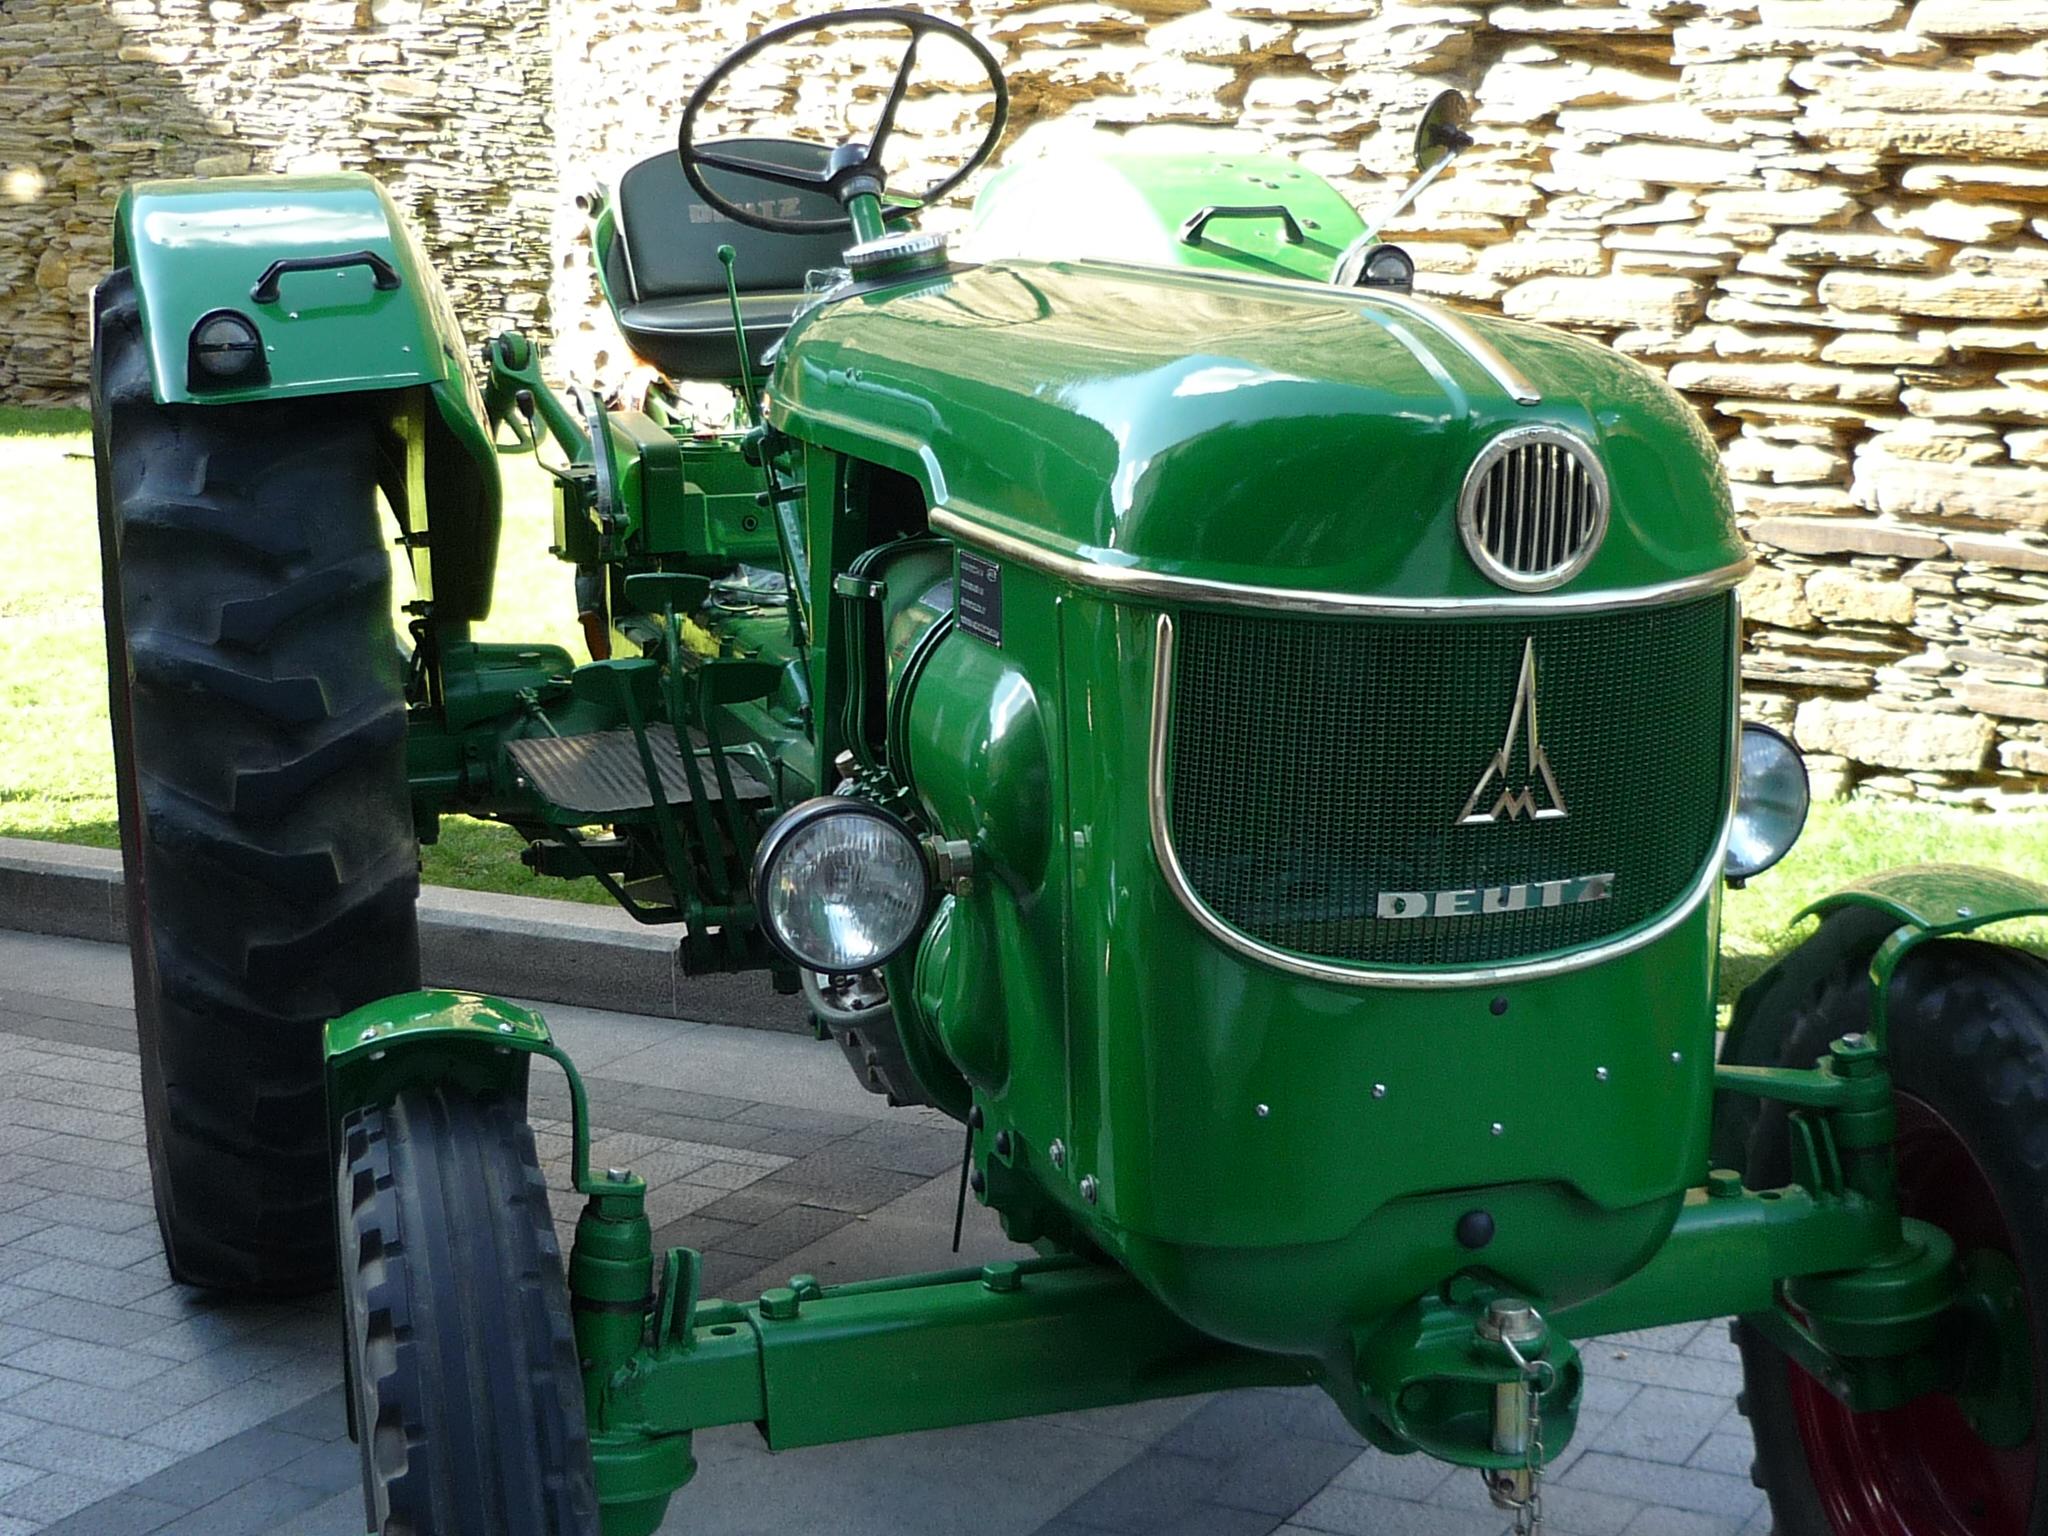 Walts Tractor Parts : Deutz allis tractor parts salvage tractors autos we